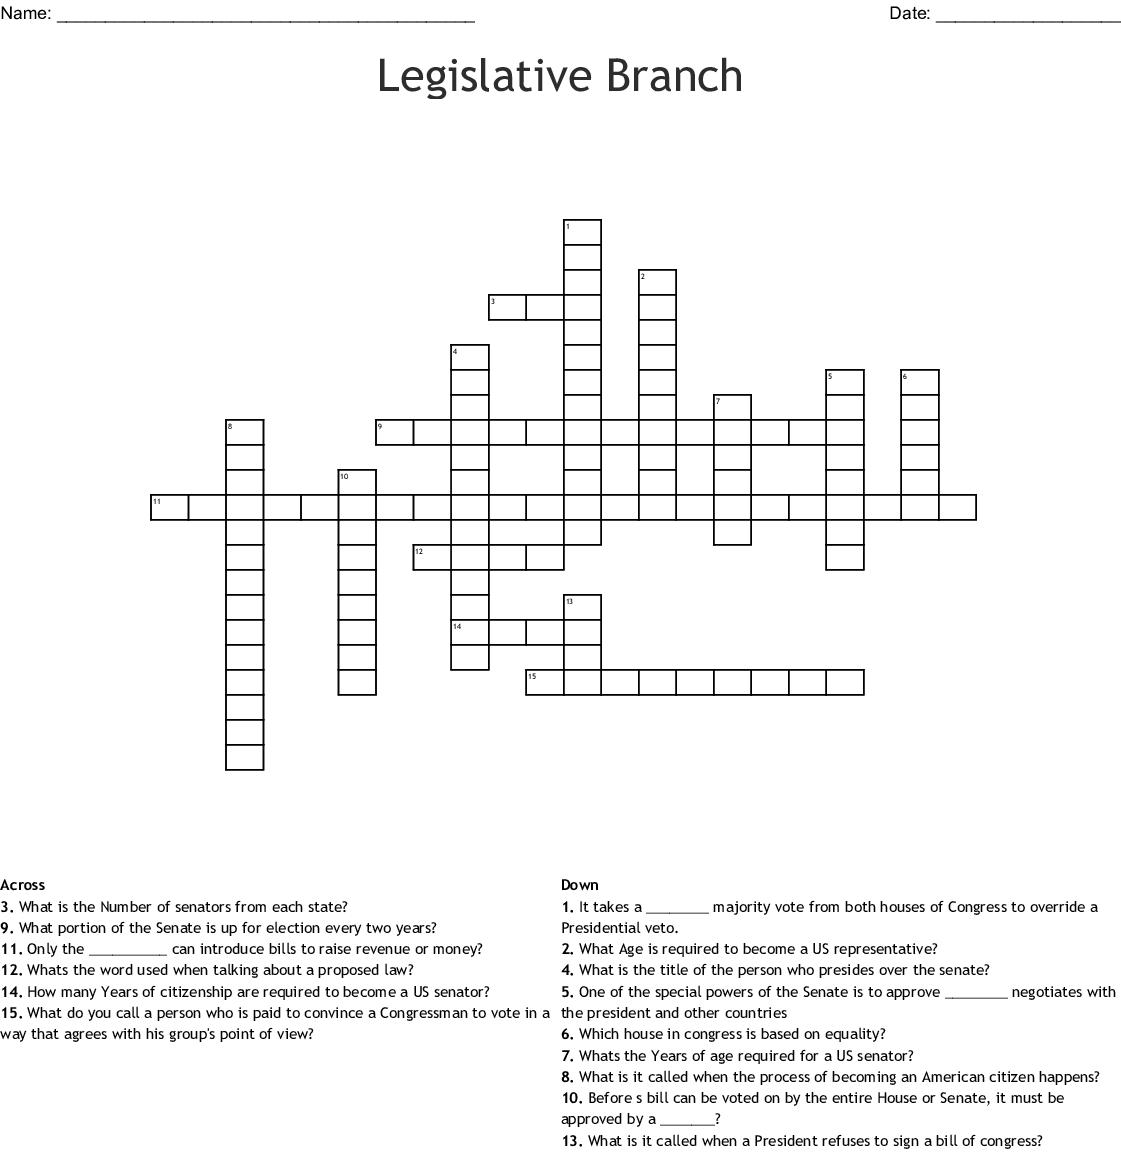 Legislative Branch Crossword